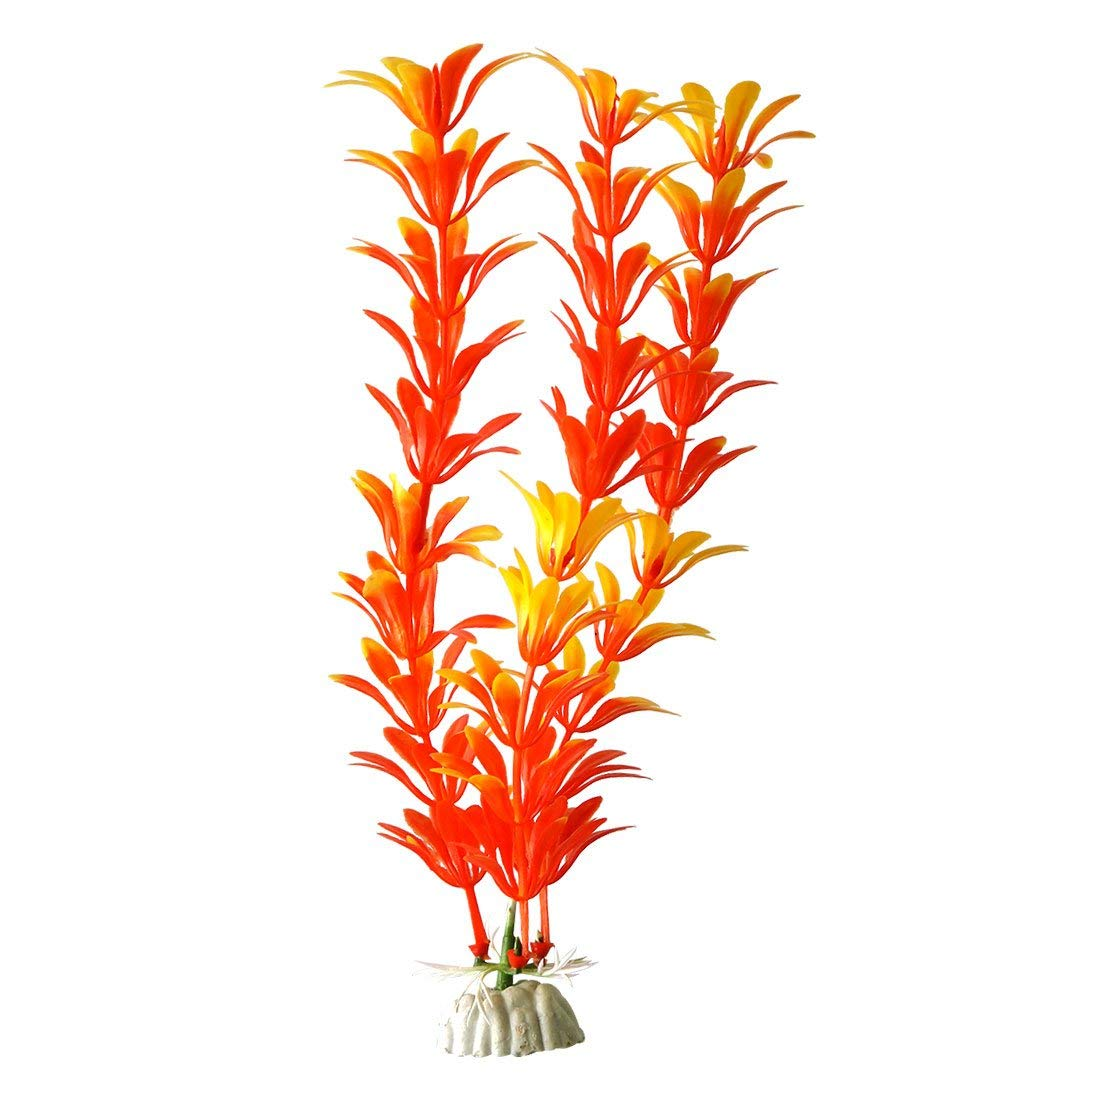 2 Pcs 11.4  Green Red Emulational Aquatic Plant Grass for Fish Tank